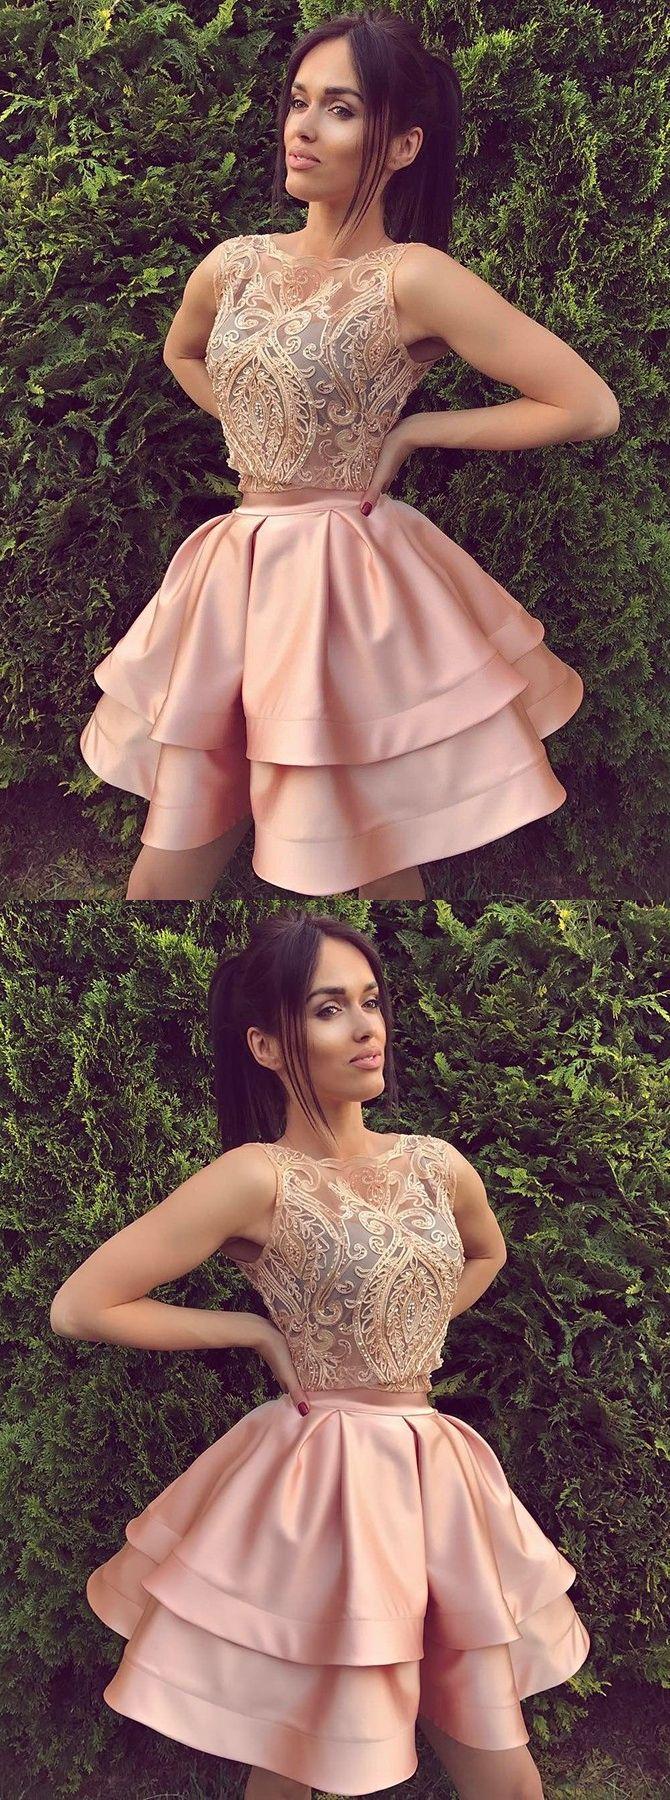 Aline crew aboveknee sleeveless pink satin homecoming dress with